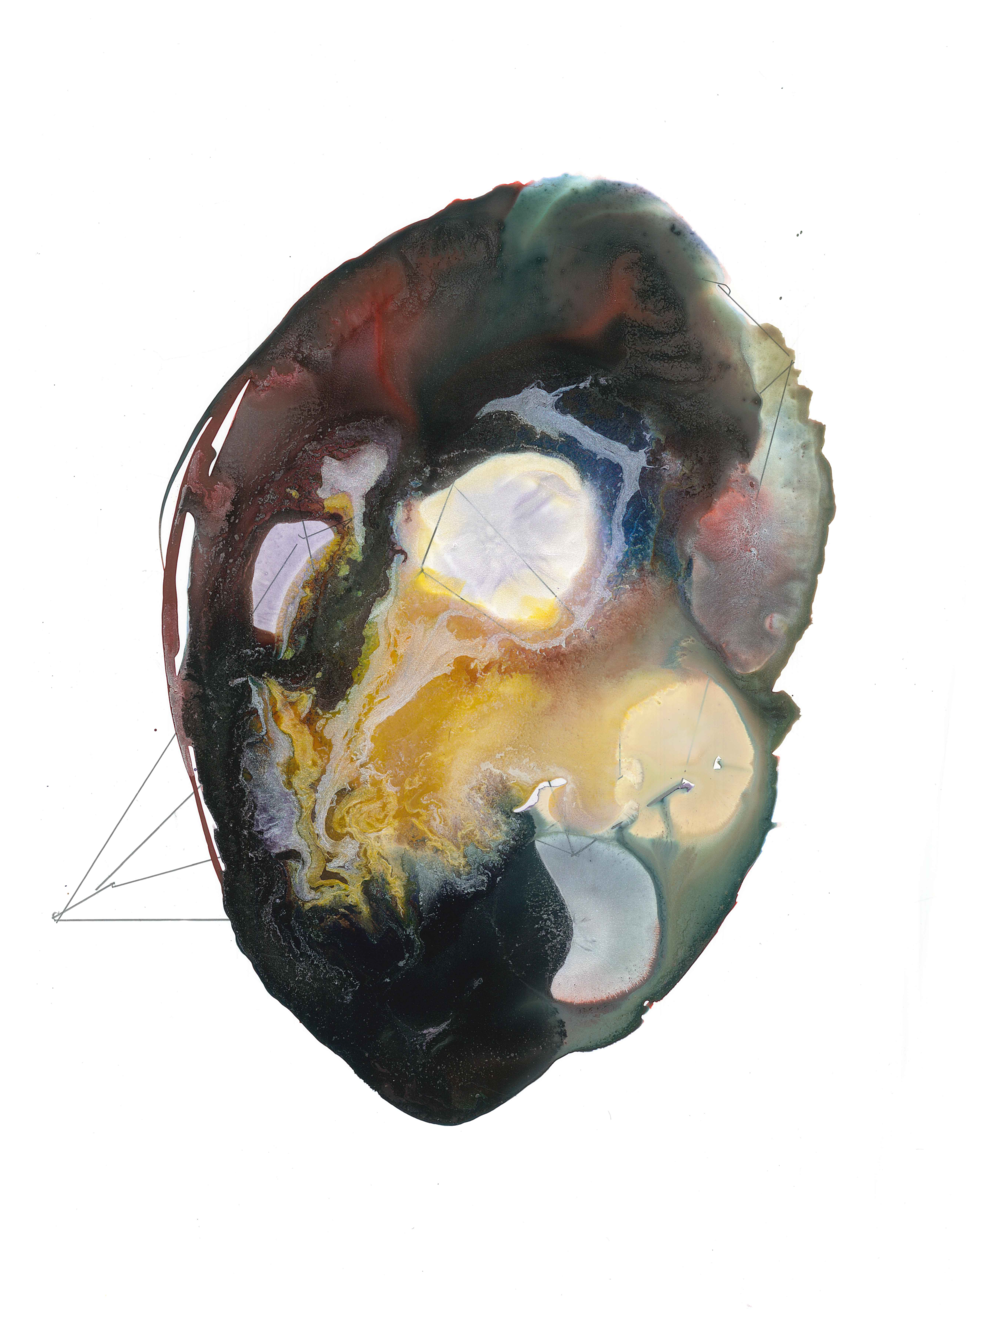 agate, crystals, gemstones8.png